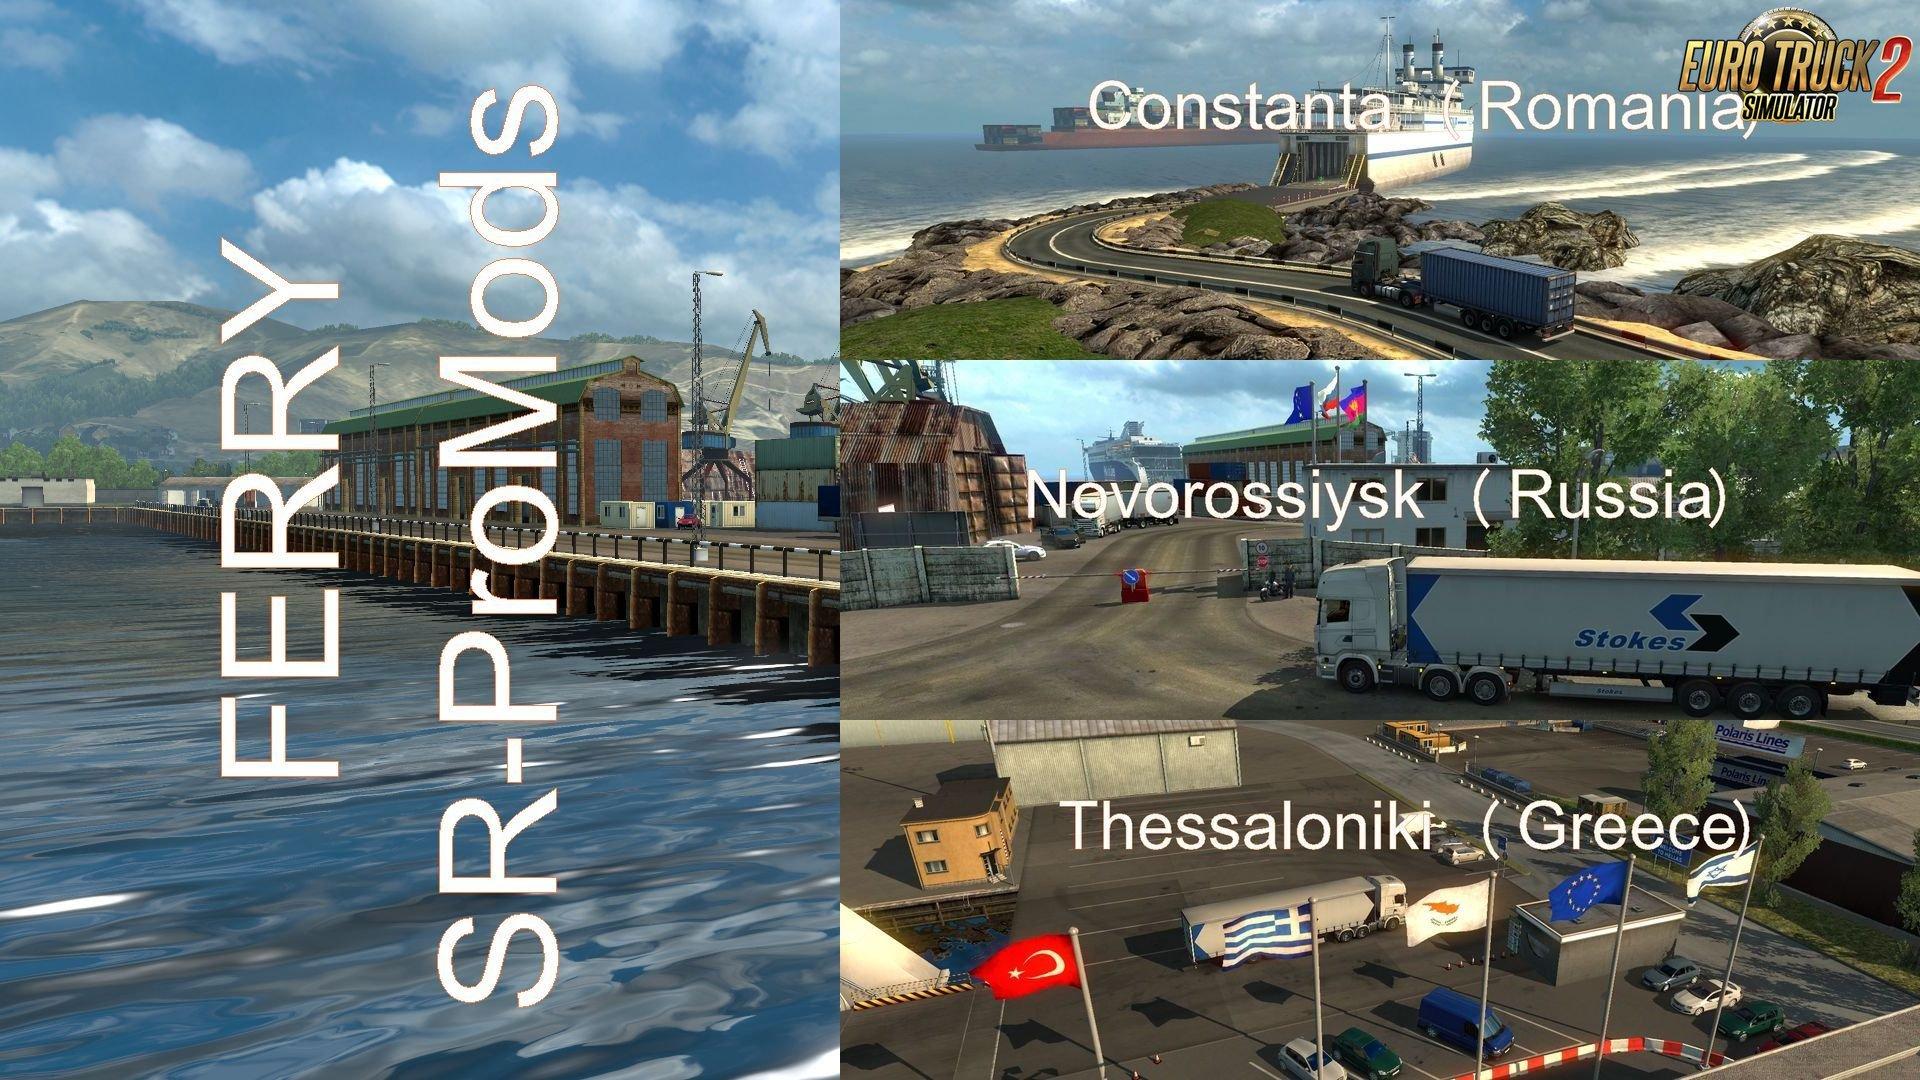 SR7 Ferry PrMod 230 DLC for Ets2 [1.31.x]